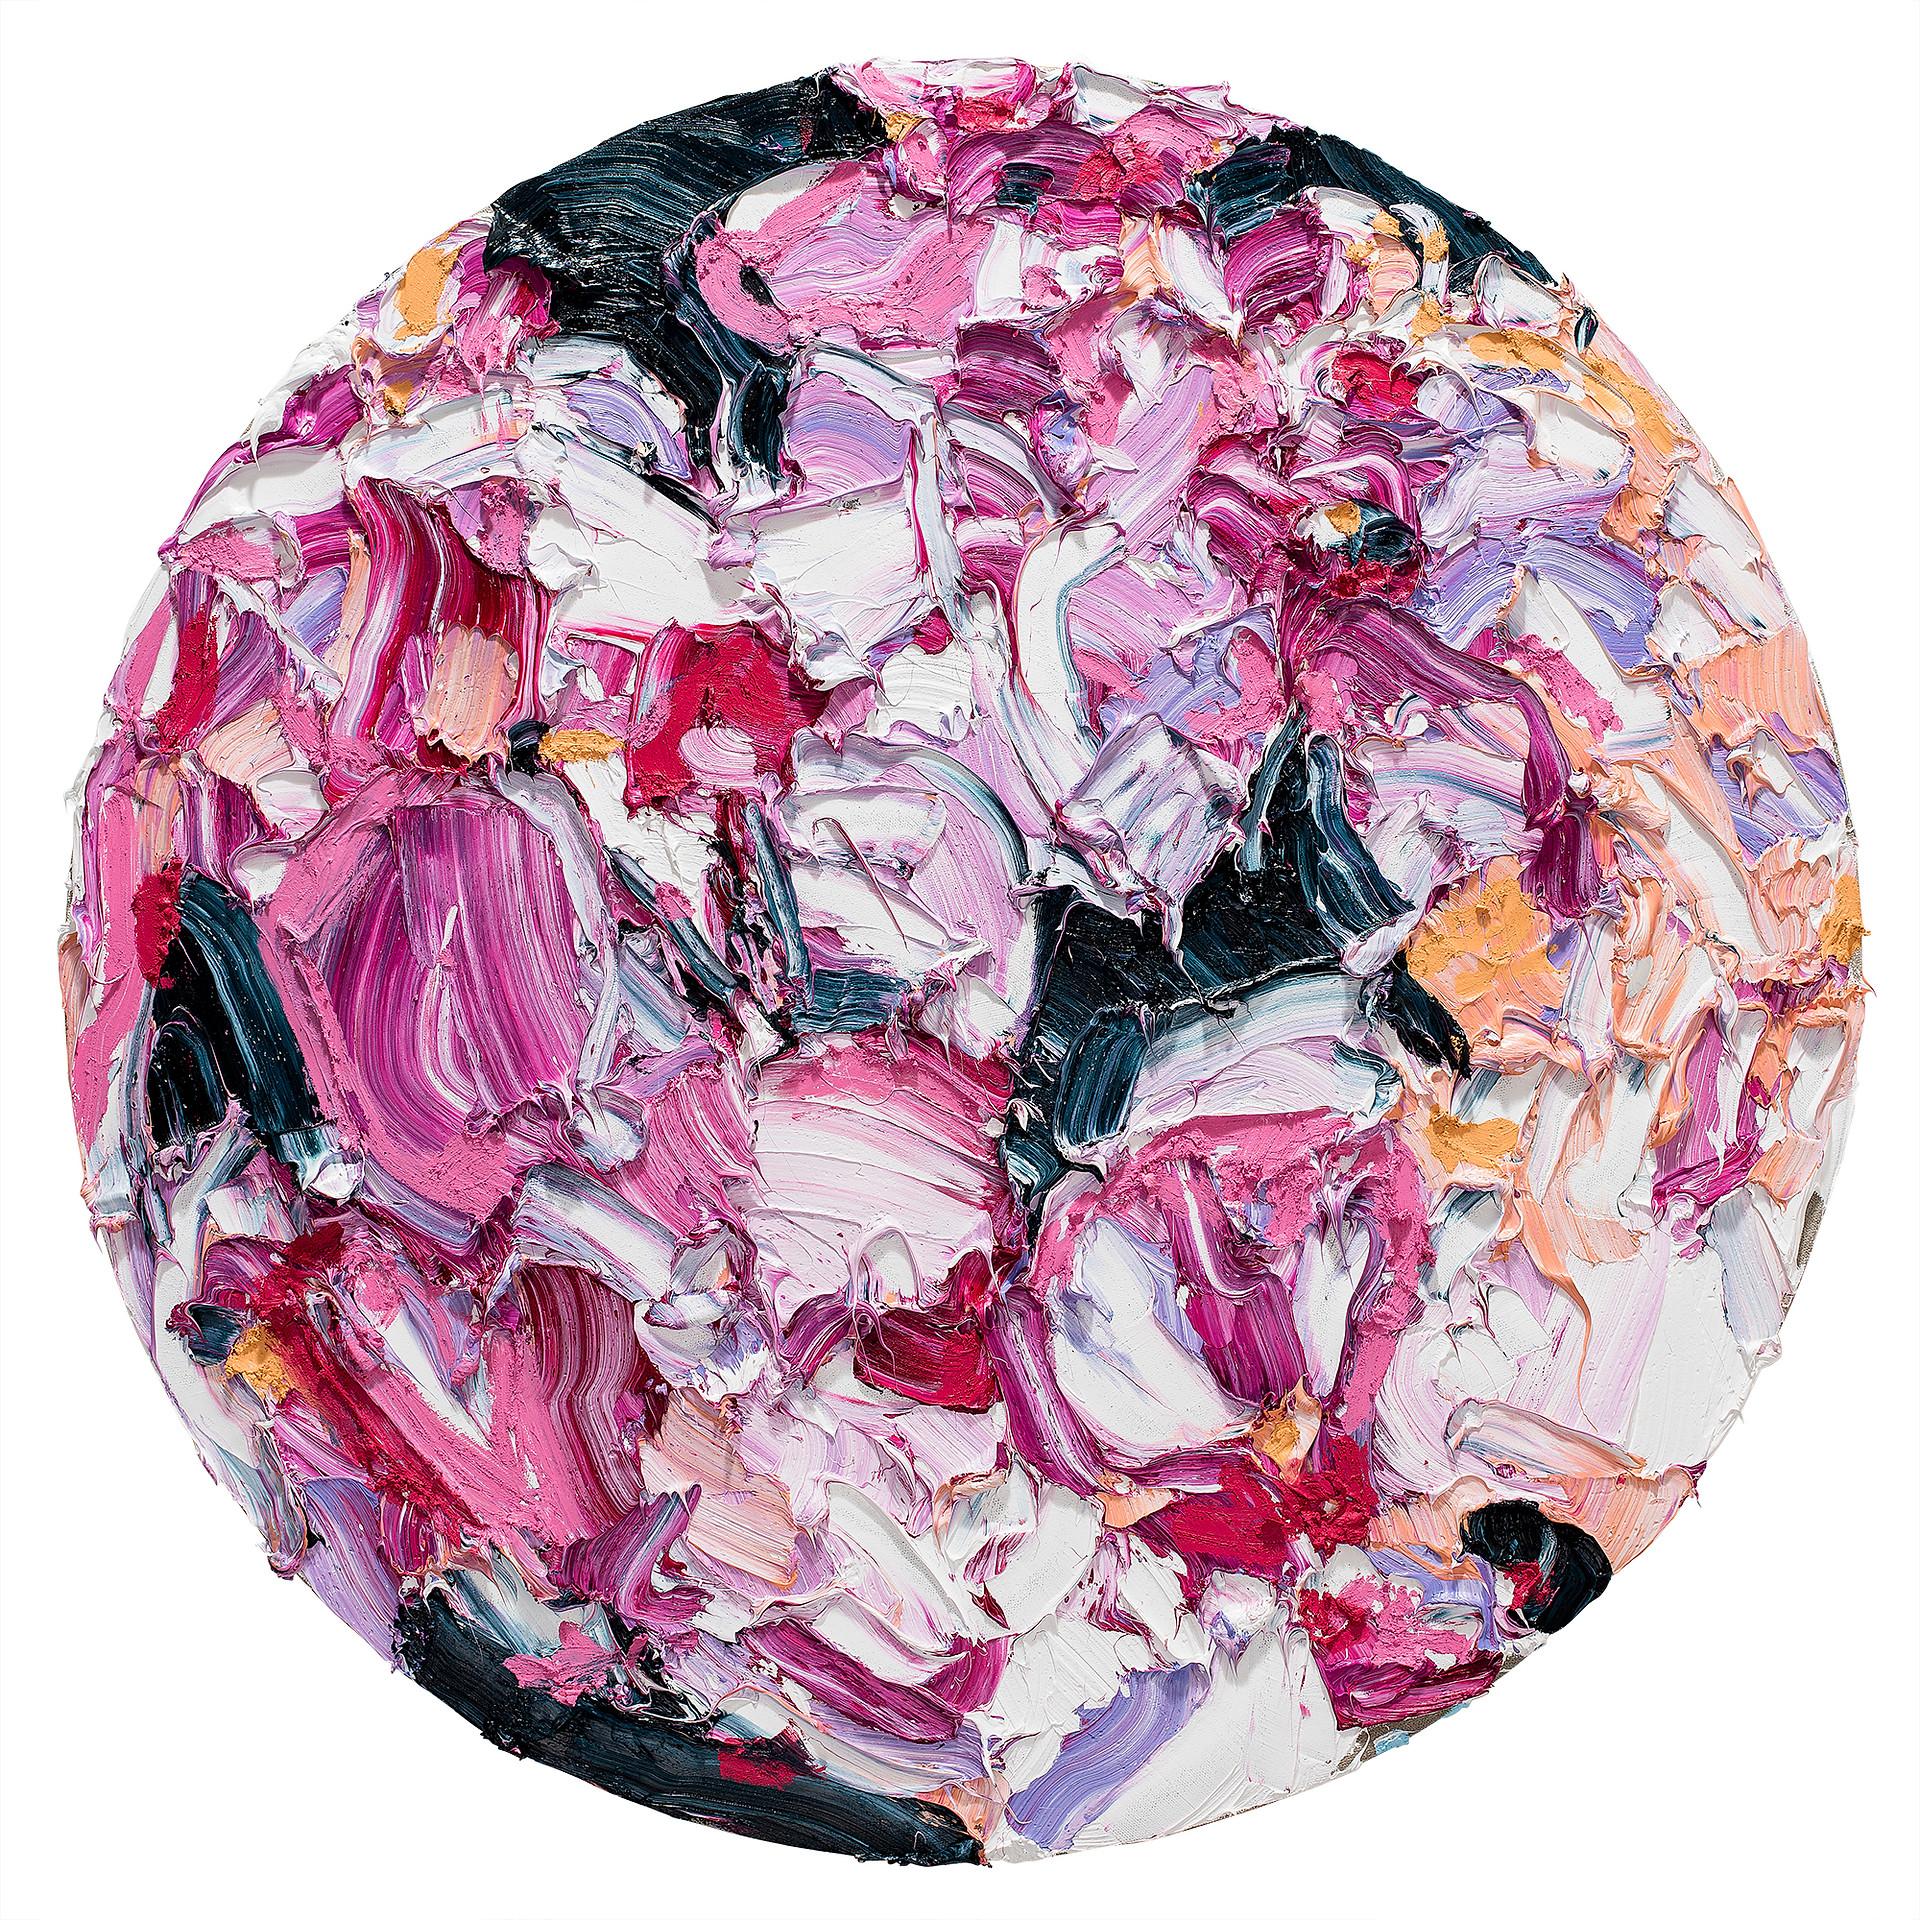 Alesandro Ljubicic Madder Fusia Bloom, 2017 Oil on linen on birch 120 cm diameter